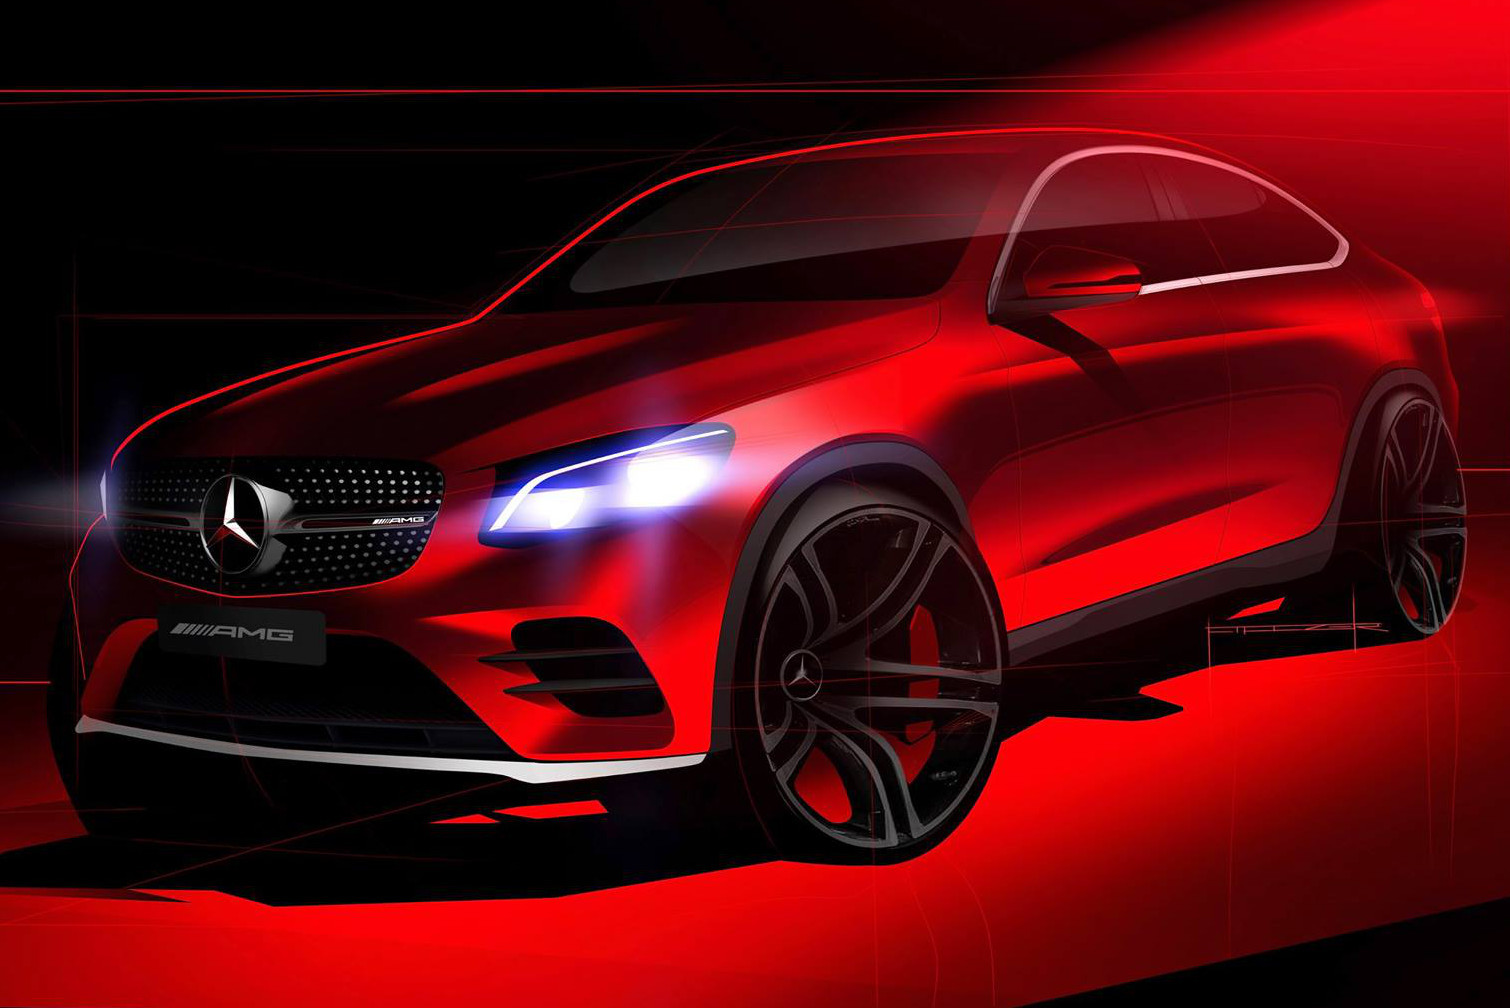 Mercedes_GLC_Coupe_image